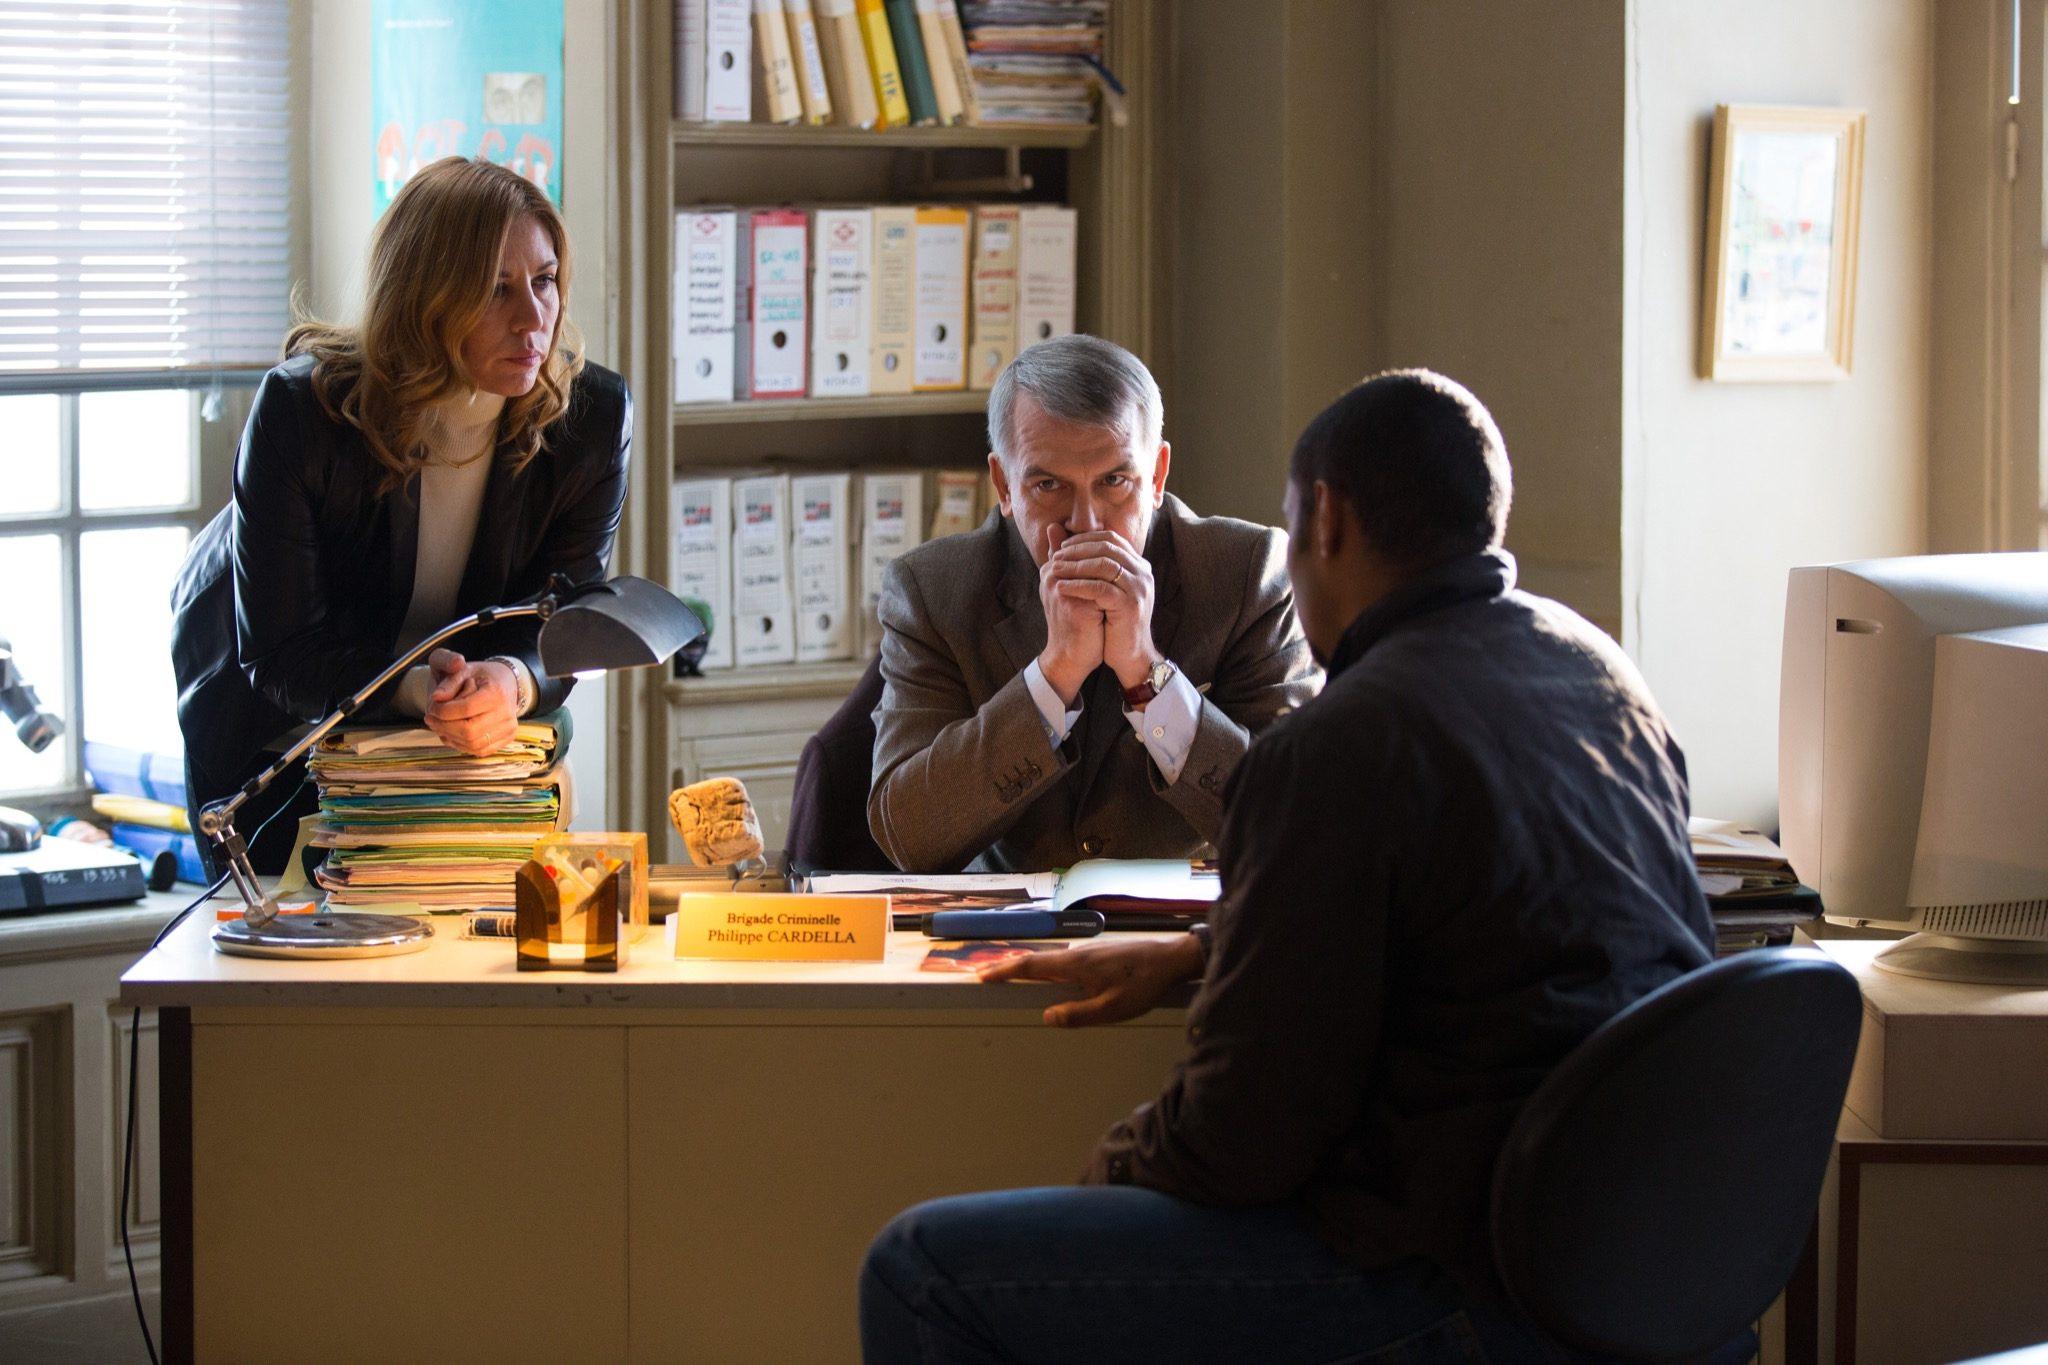 Flic, tout simplement d'Yves Rénier image Philippe TORRETON, Mathilde SEIGNER, Djibril GUEYE